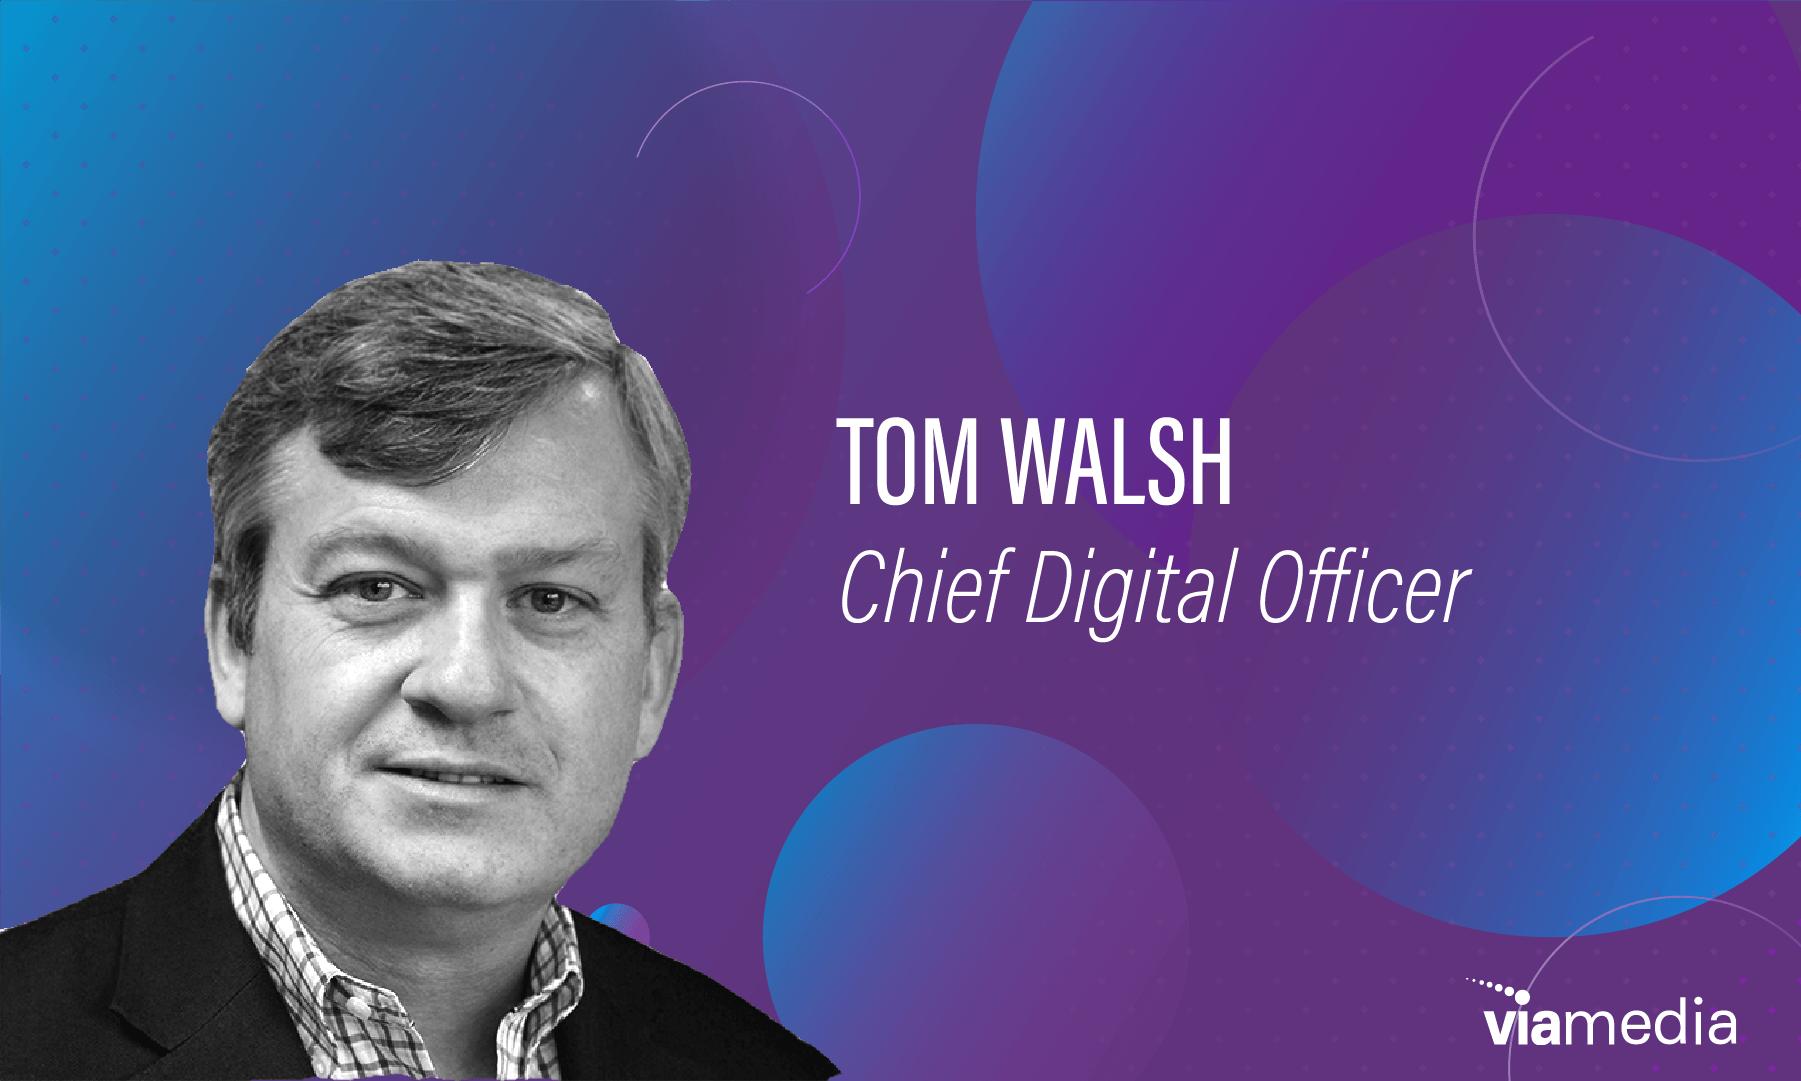 Tom Walsh, Chief Digital Officer@2x-8-1